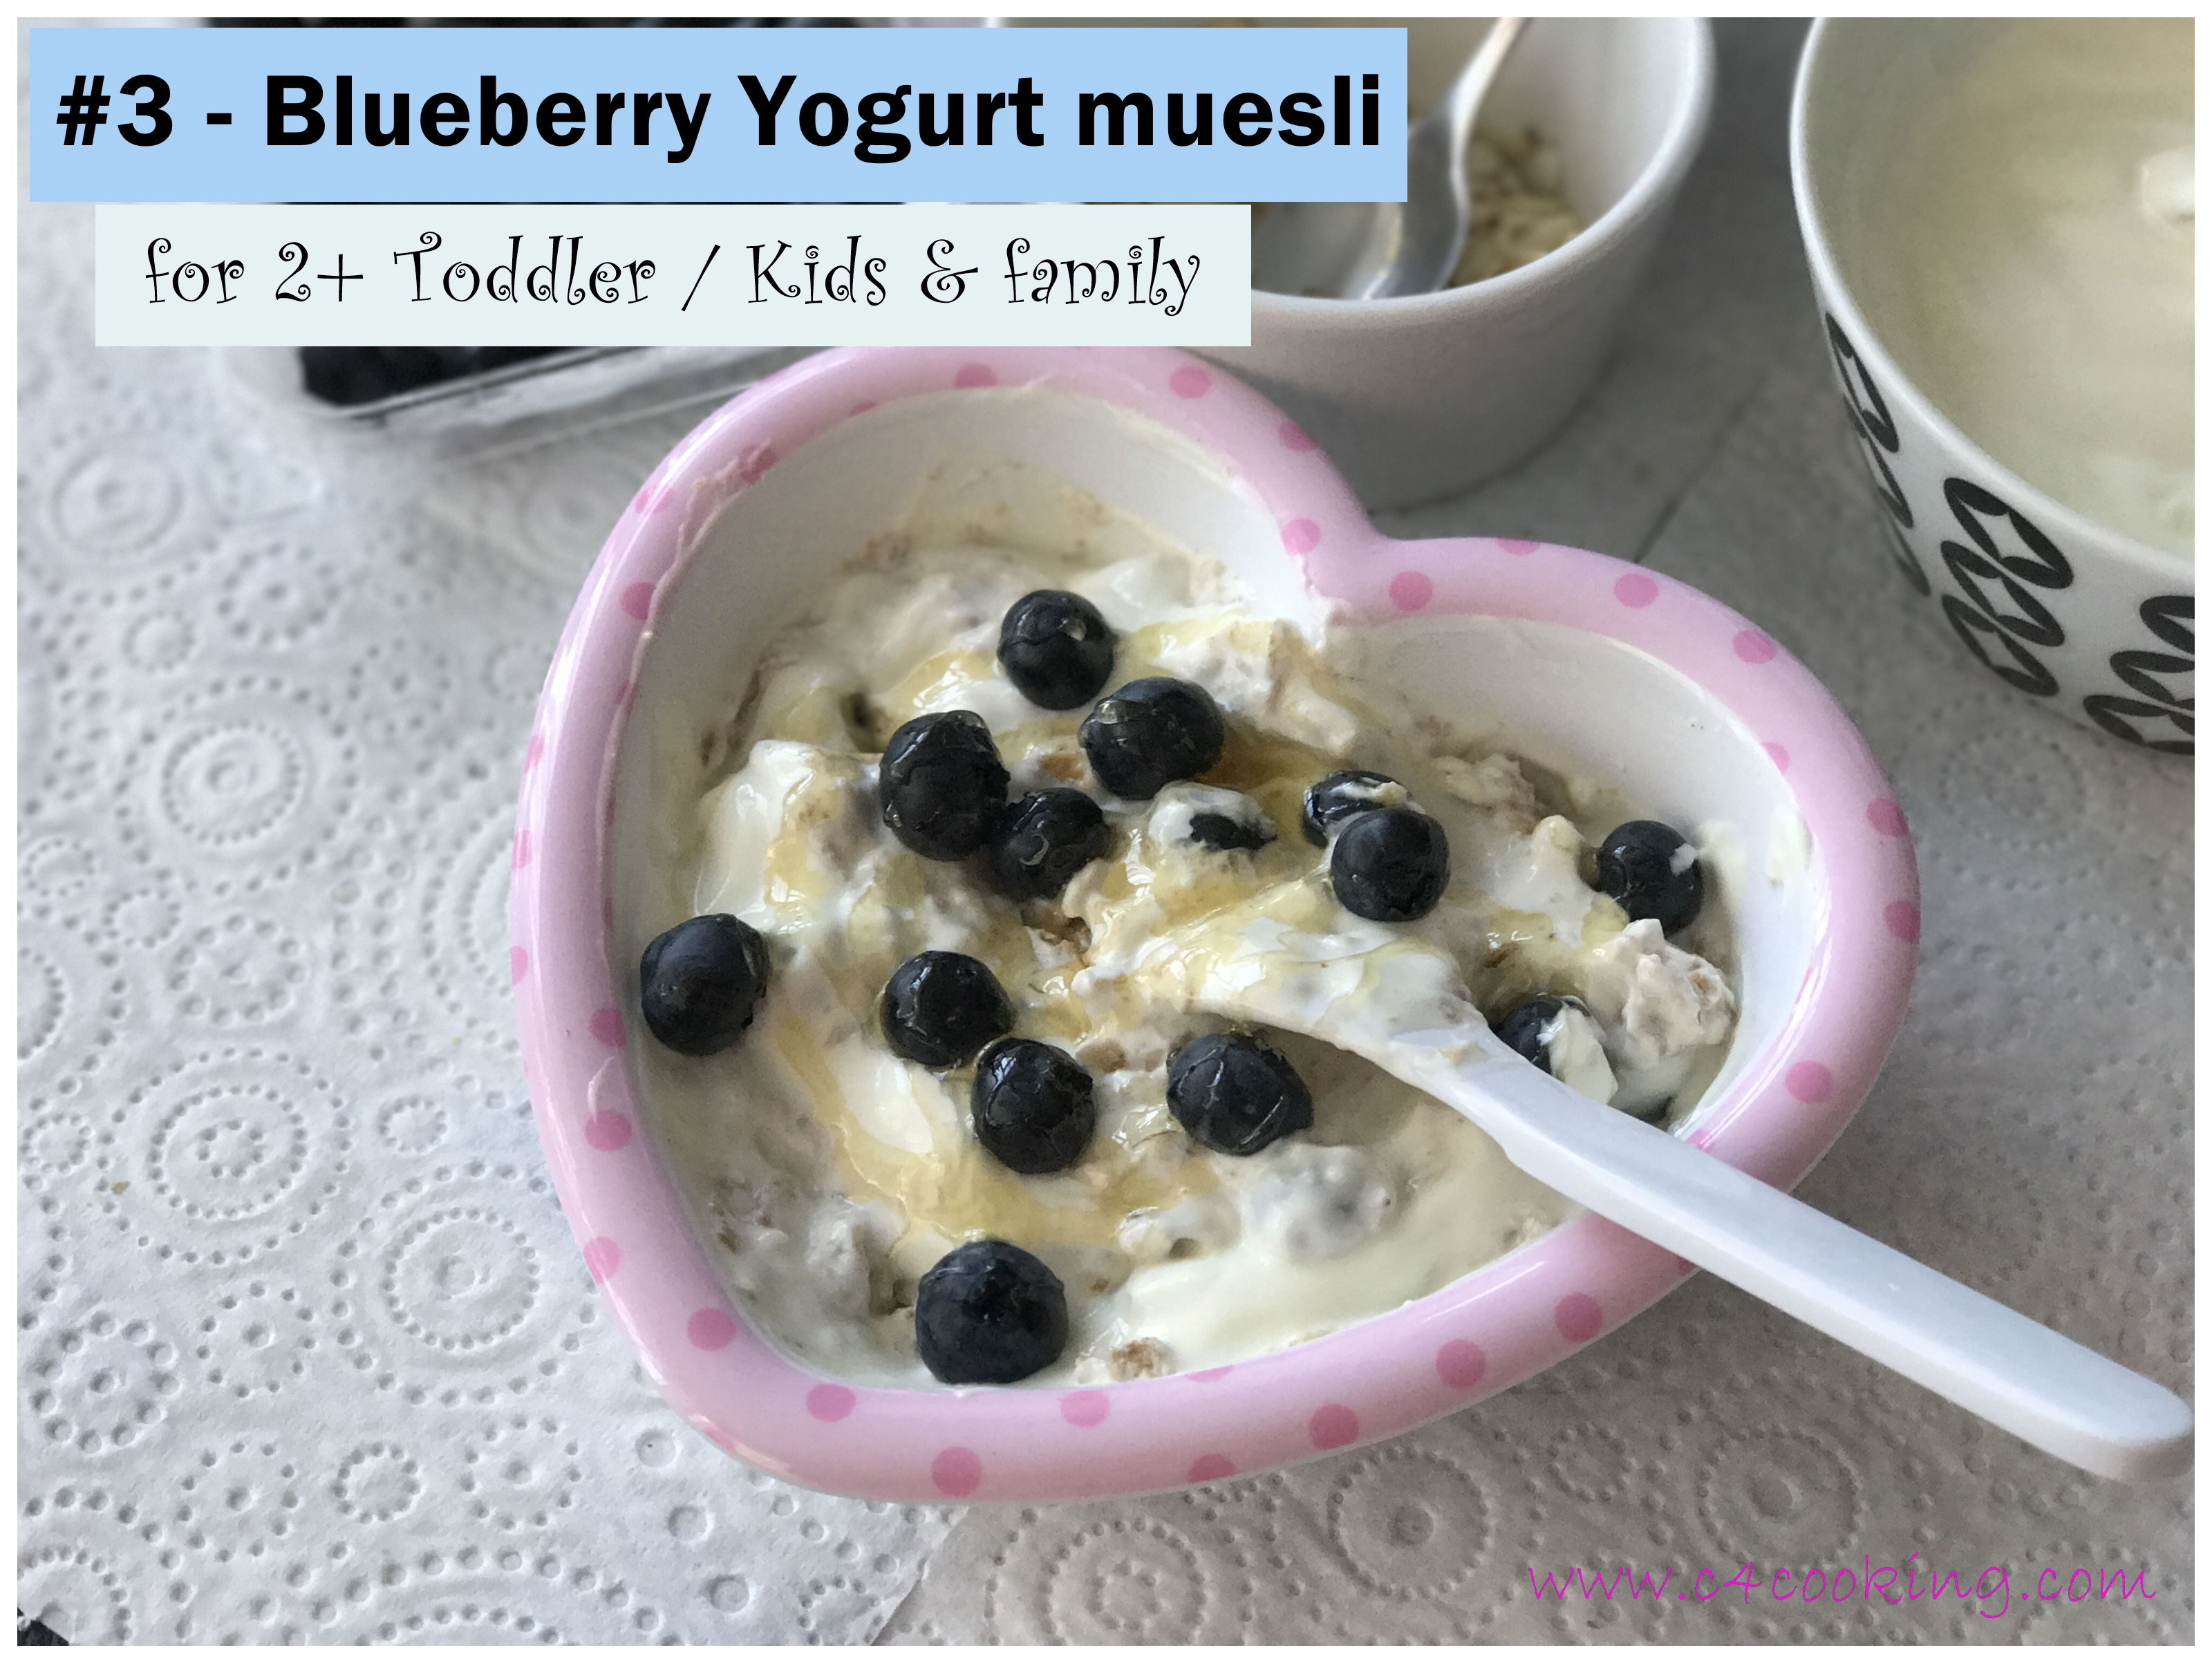 Blueberry Yogurt muesli, breakfast muesli recipes